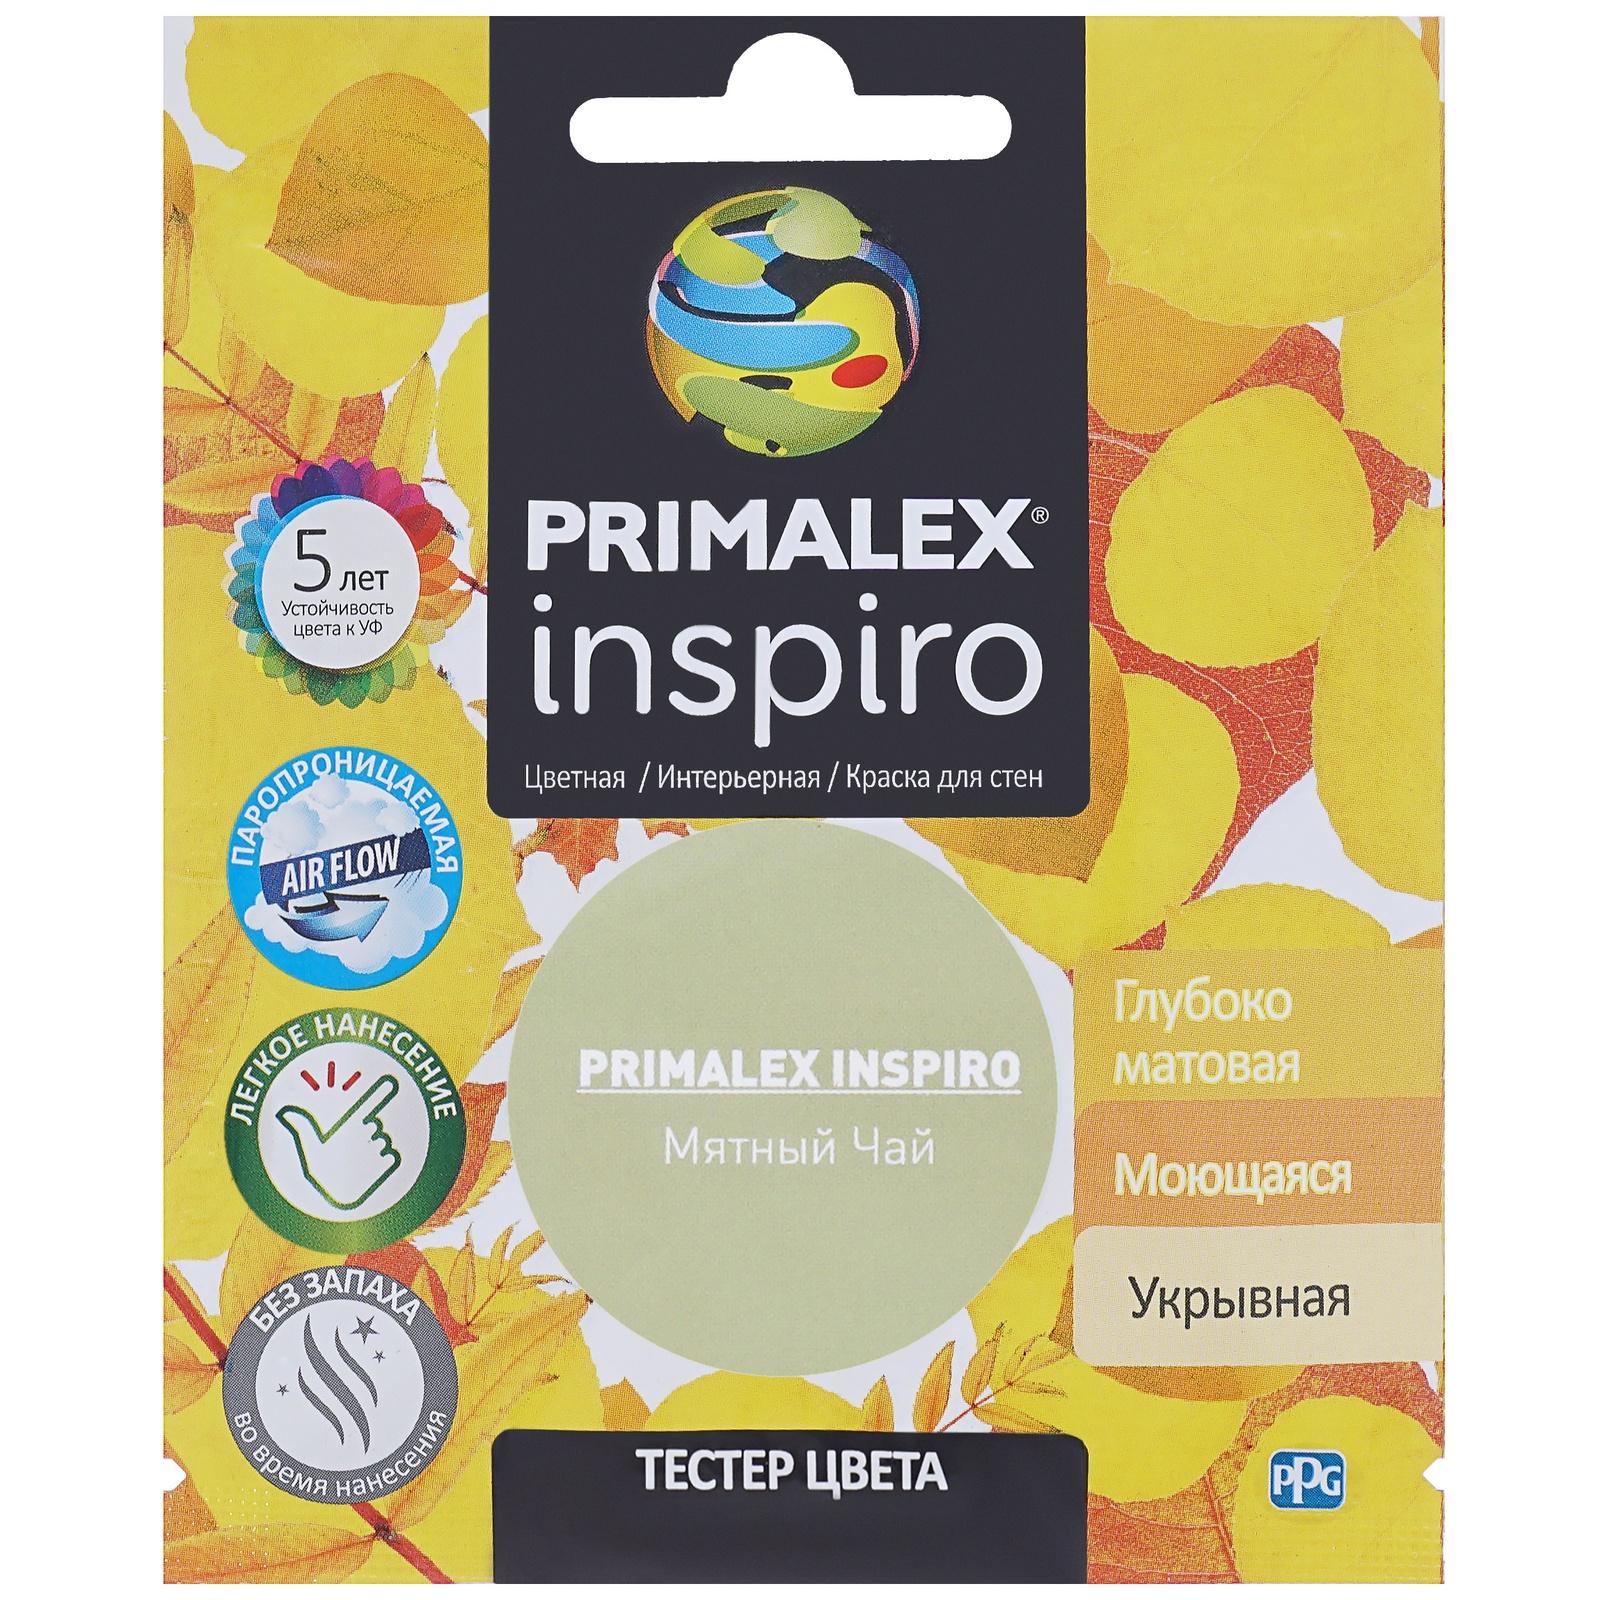 Краска PPG Primalex Inspiro Мятный Чай 40мл краска ppg primalex inspiro красный мак 40мл pmx i47